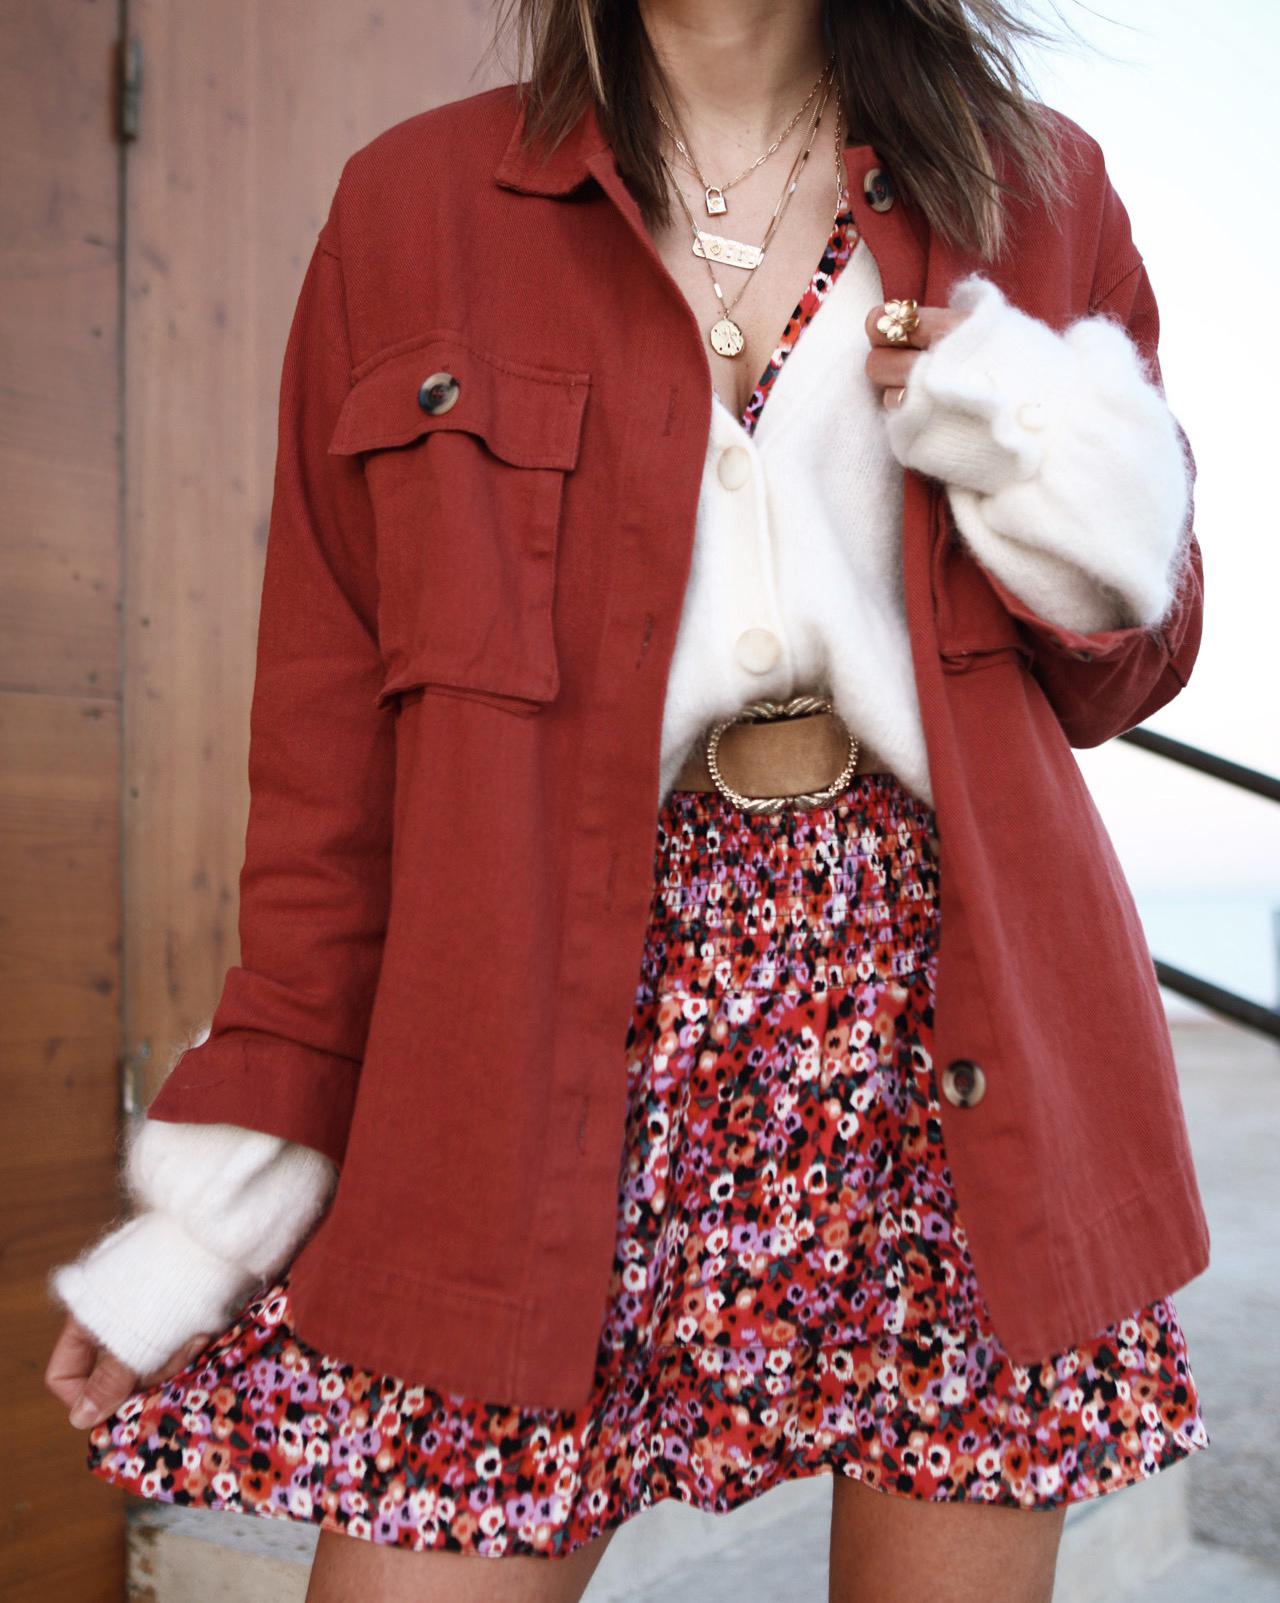 ceinture sézane, mini robe fleurs, look printanier www.chonandchon.com